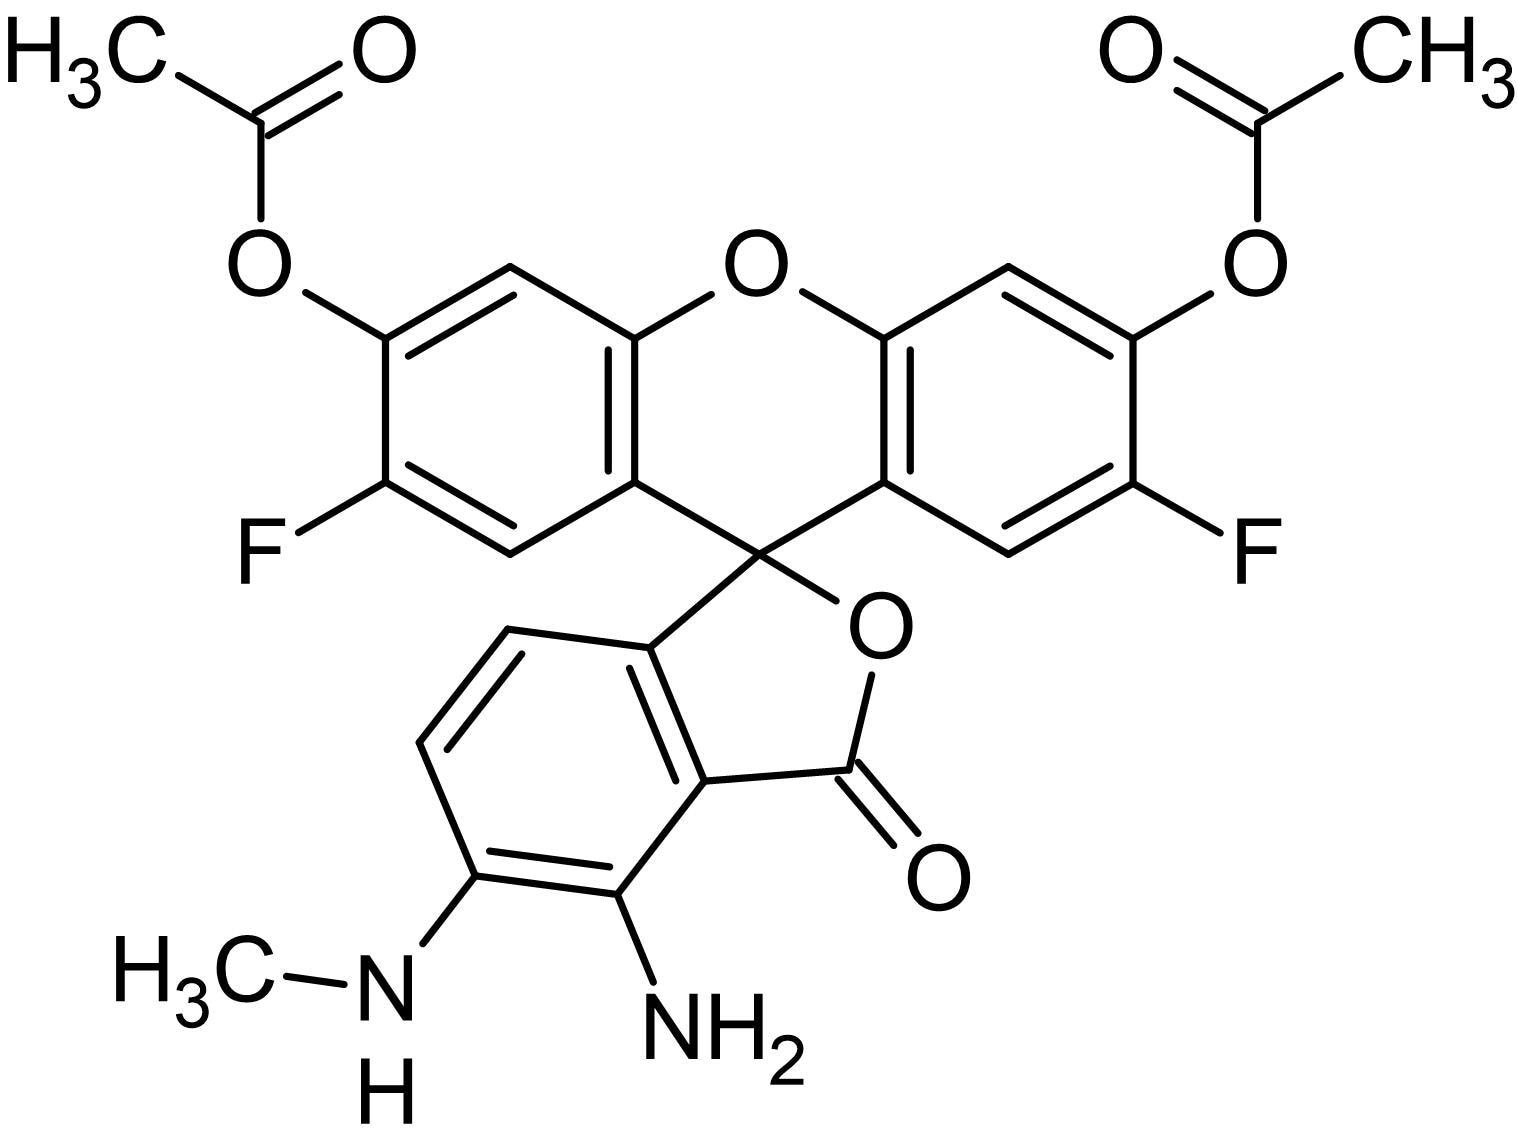 Chemical Structure - DAF-FM DA, Nitric oxide quantification reagent (ab145295)